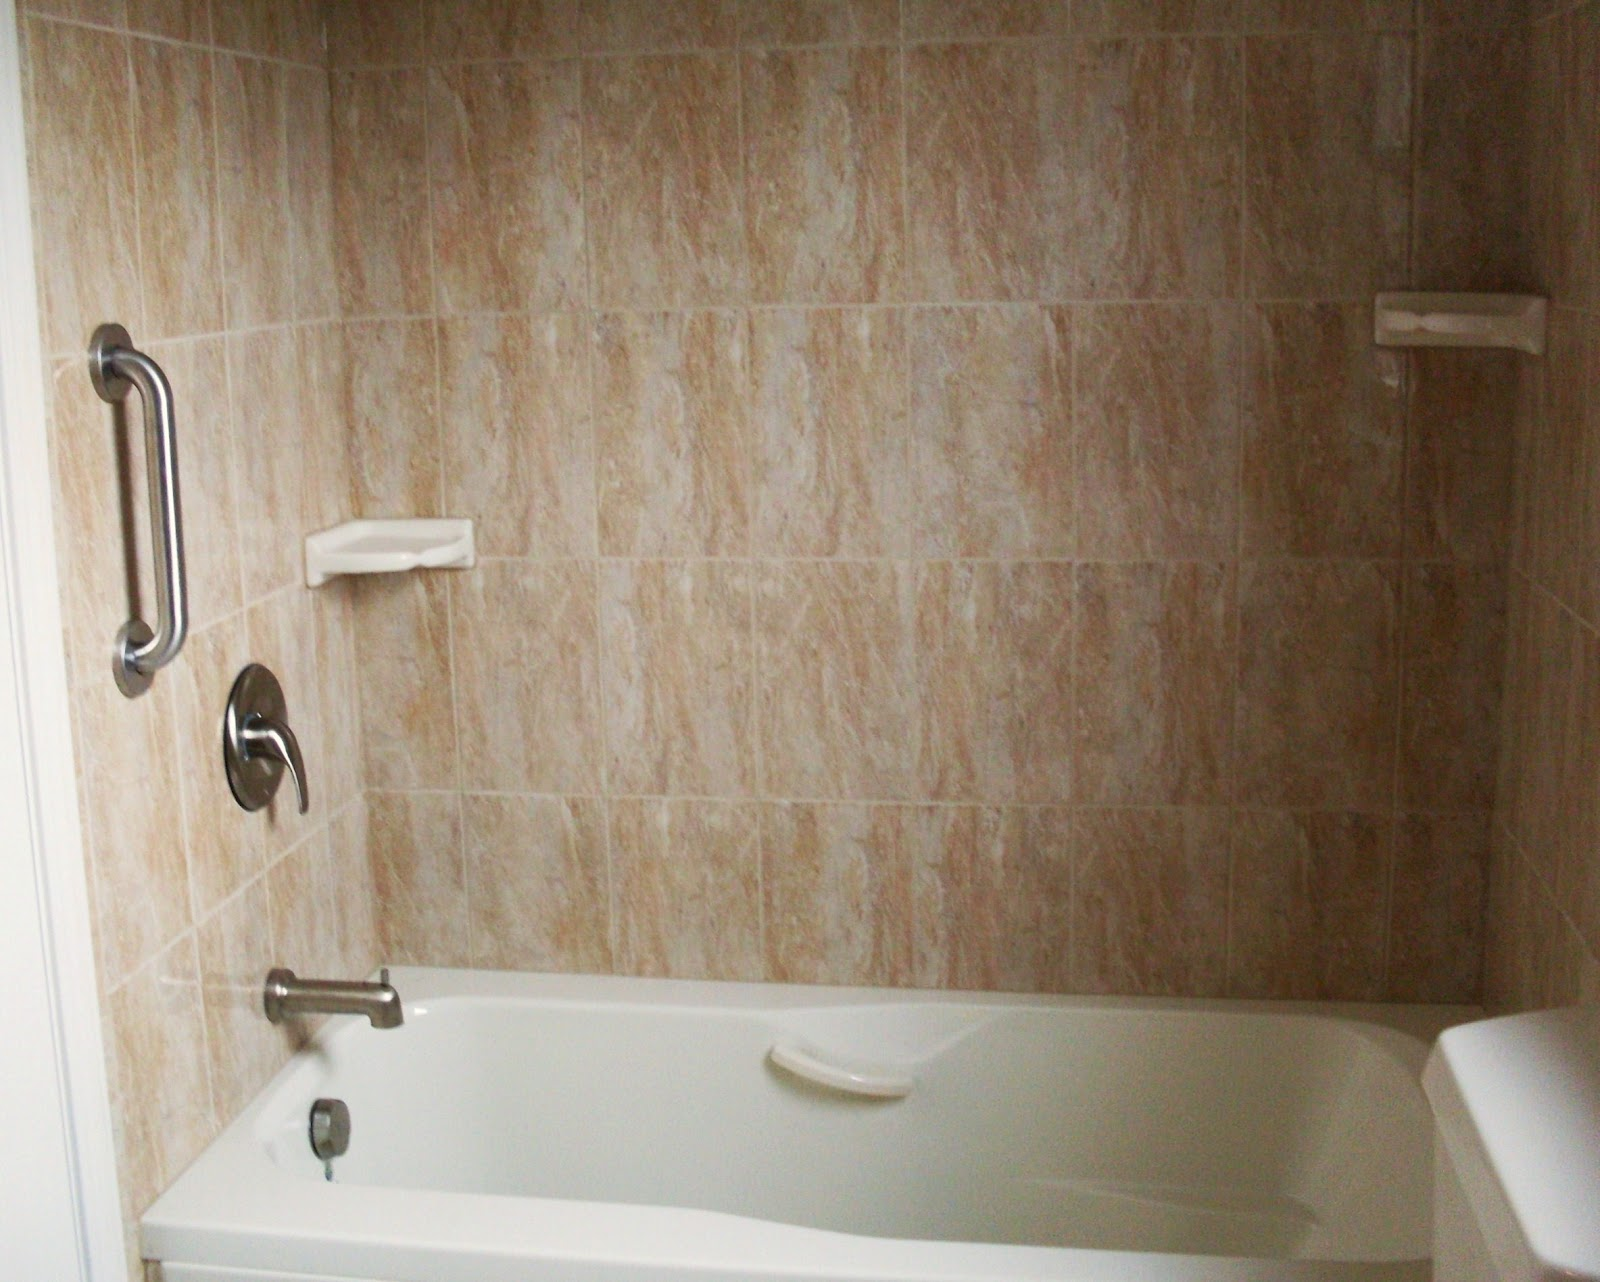 Tile Tub Surround Design Ideas